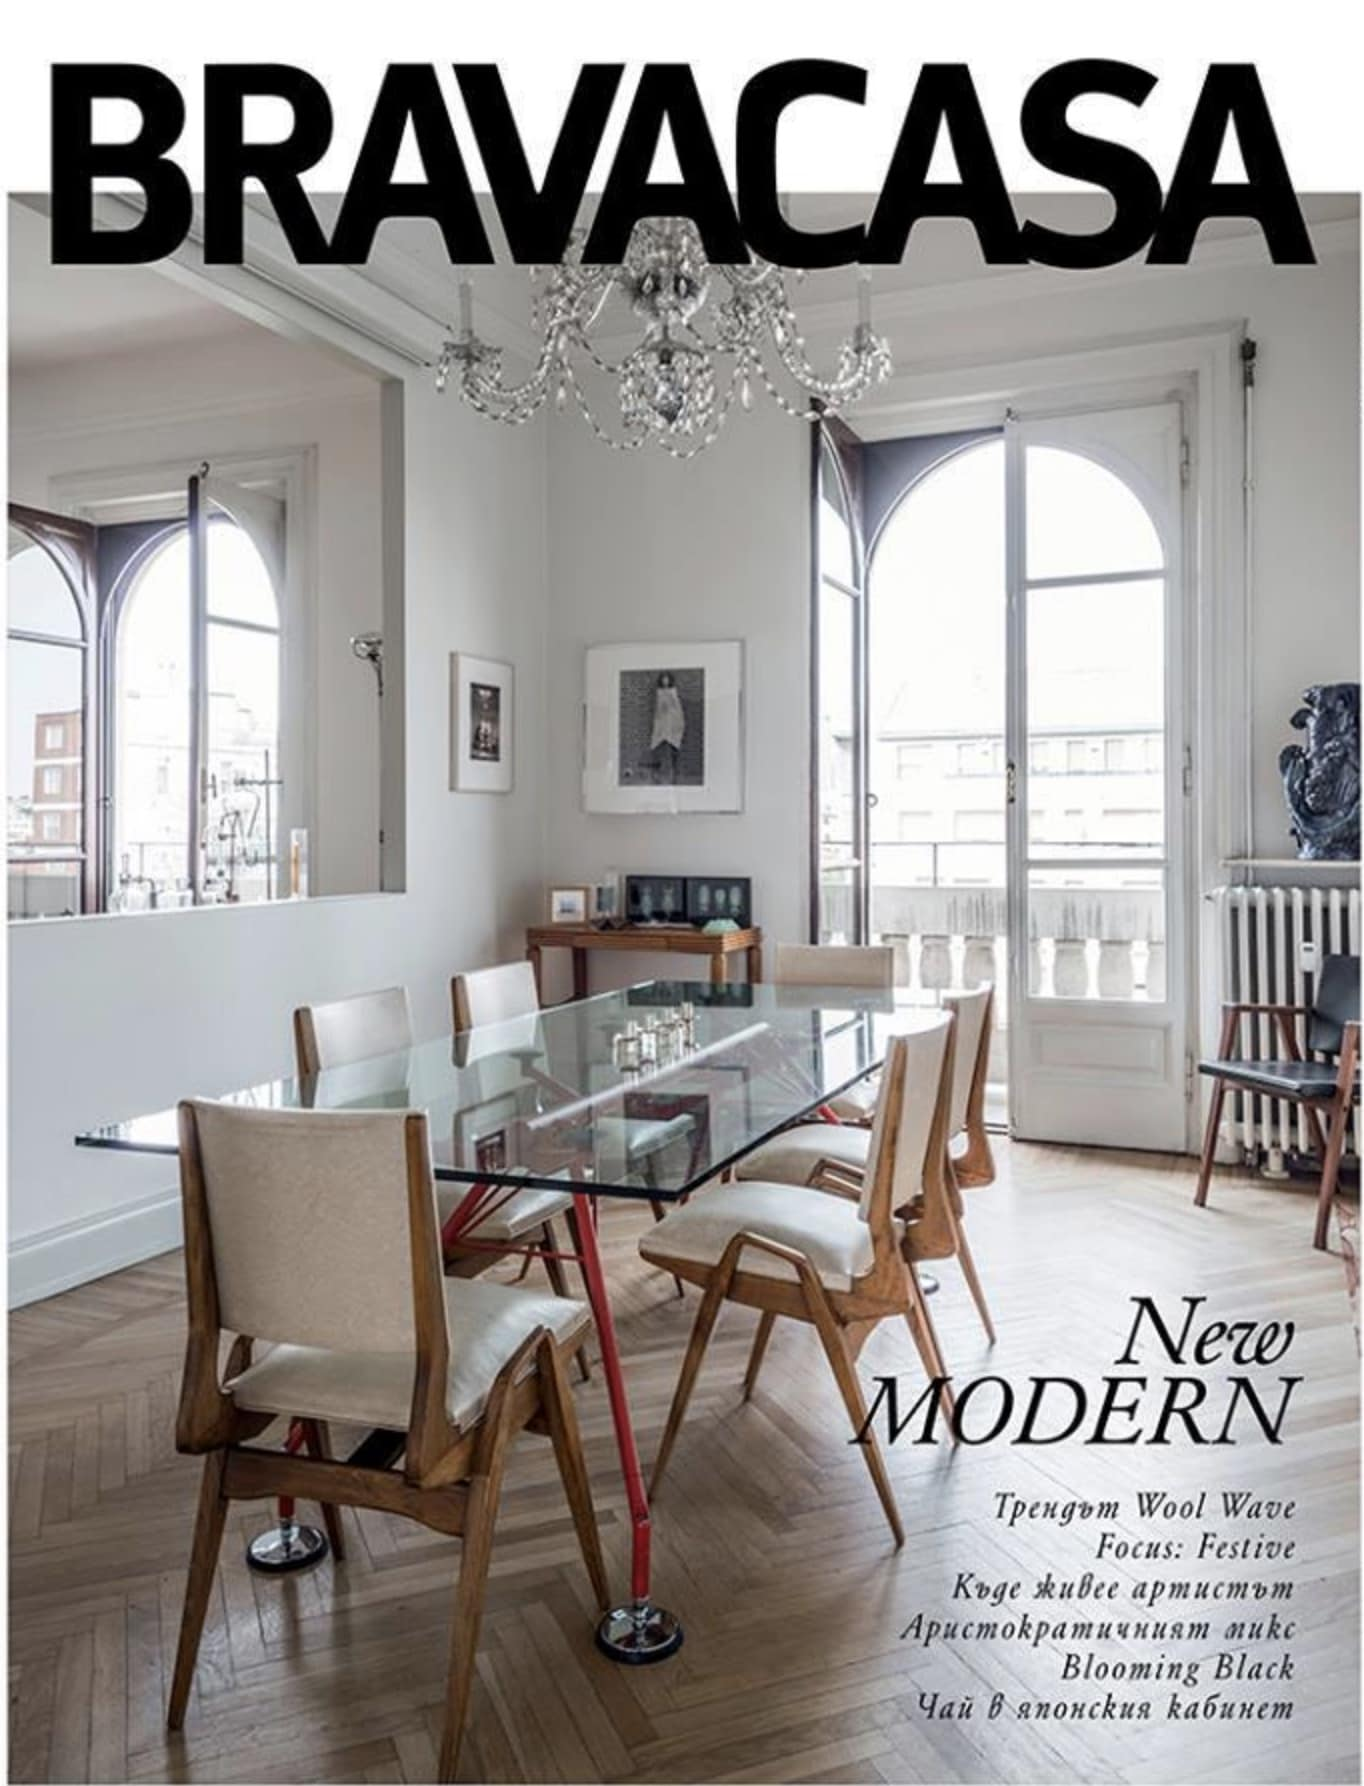 Bravacasa-interioren-dizain-residential-park-sofia1